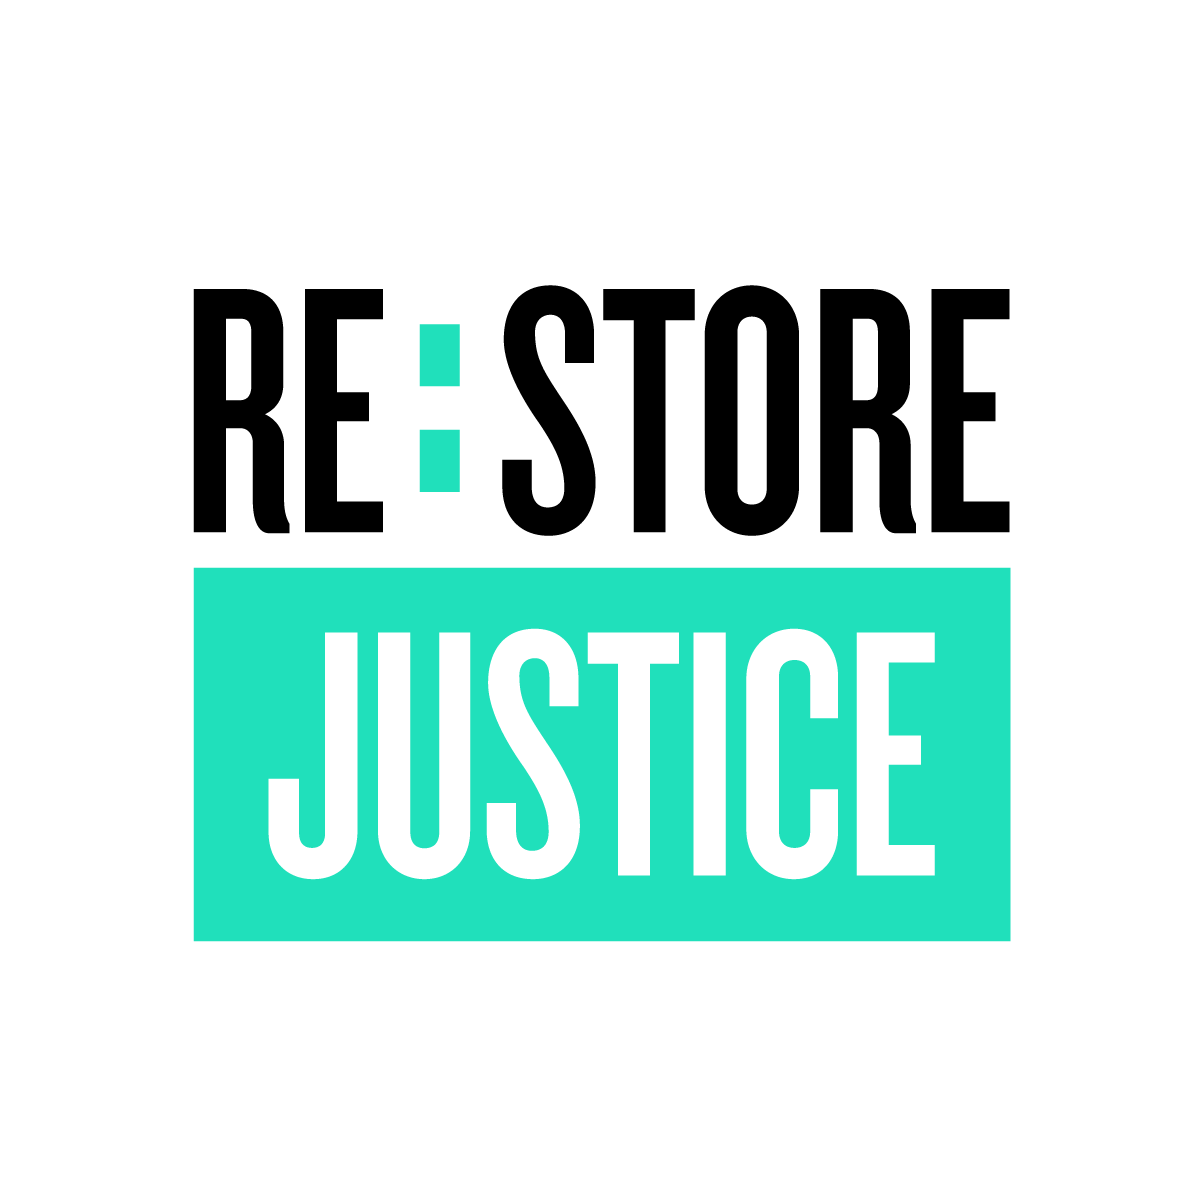 Restore Justice Logo